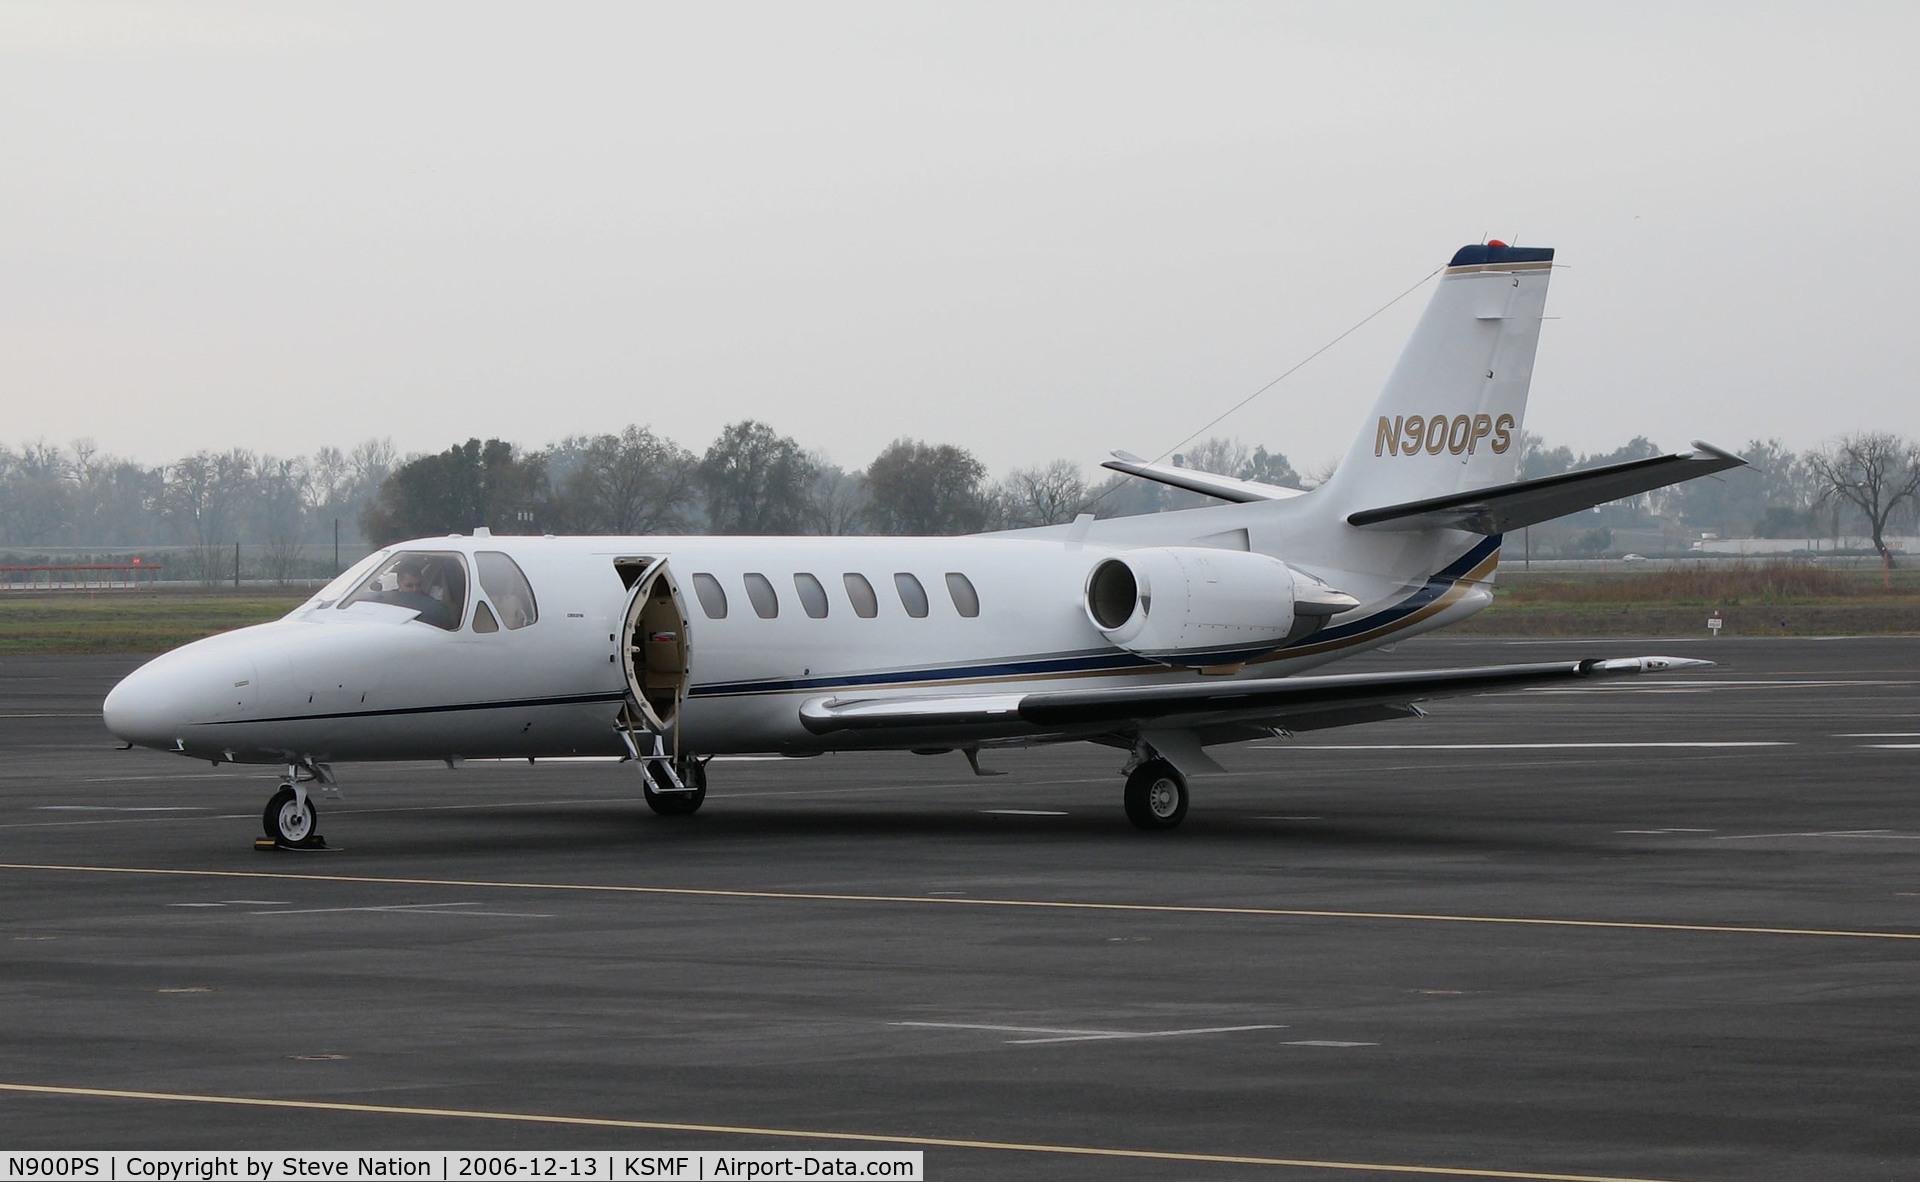 N900PS, 1991 Cessna 560 Citation V C/N 560-0118, Papa Sierra LLC, Bend, OR 1991 Cessna 560 on Executive Terminal ramp @ Sacramento International Airport, CA